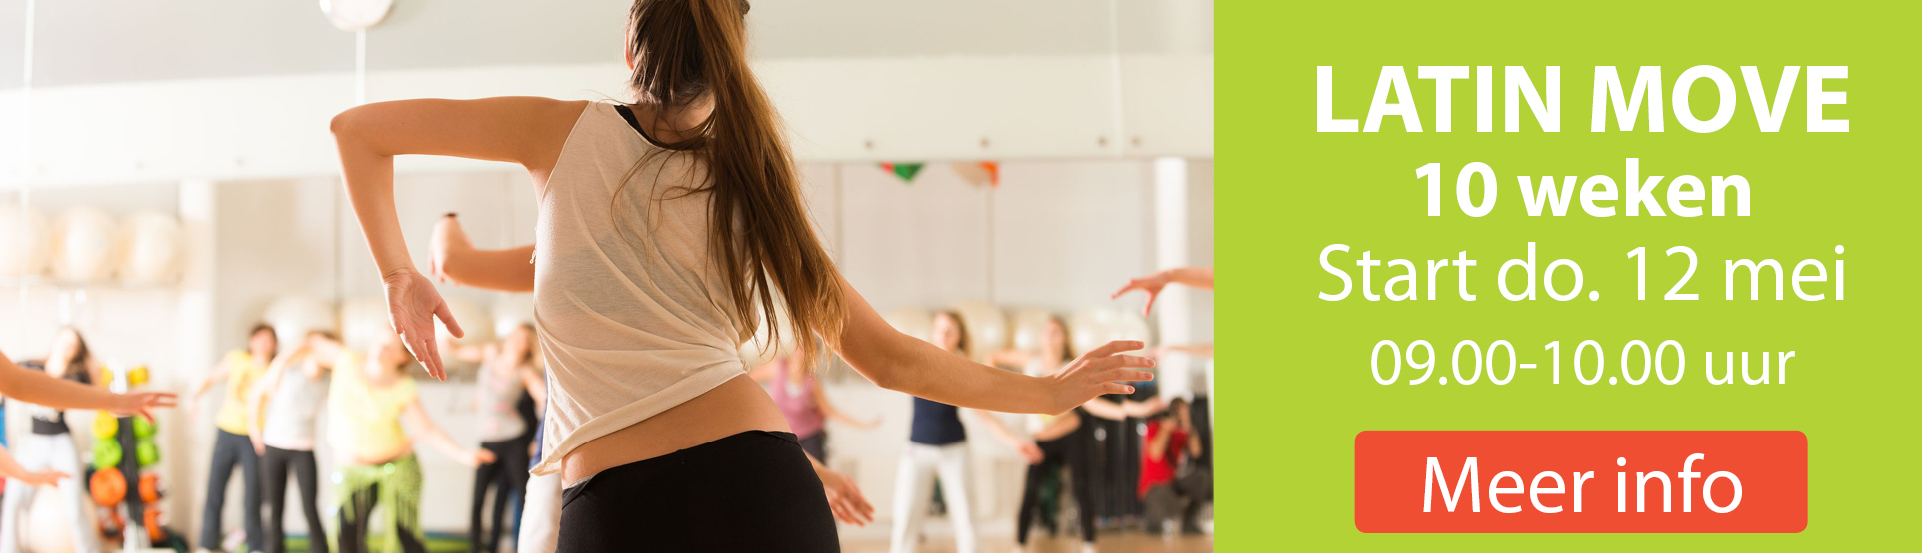 slider-Latin-move-mei-Sportstudio-de-Boer